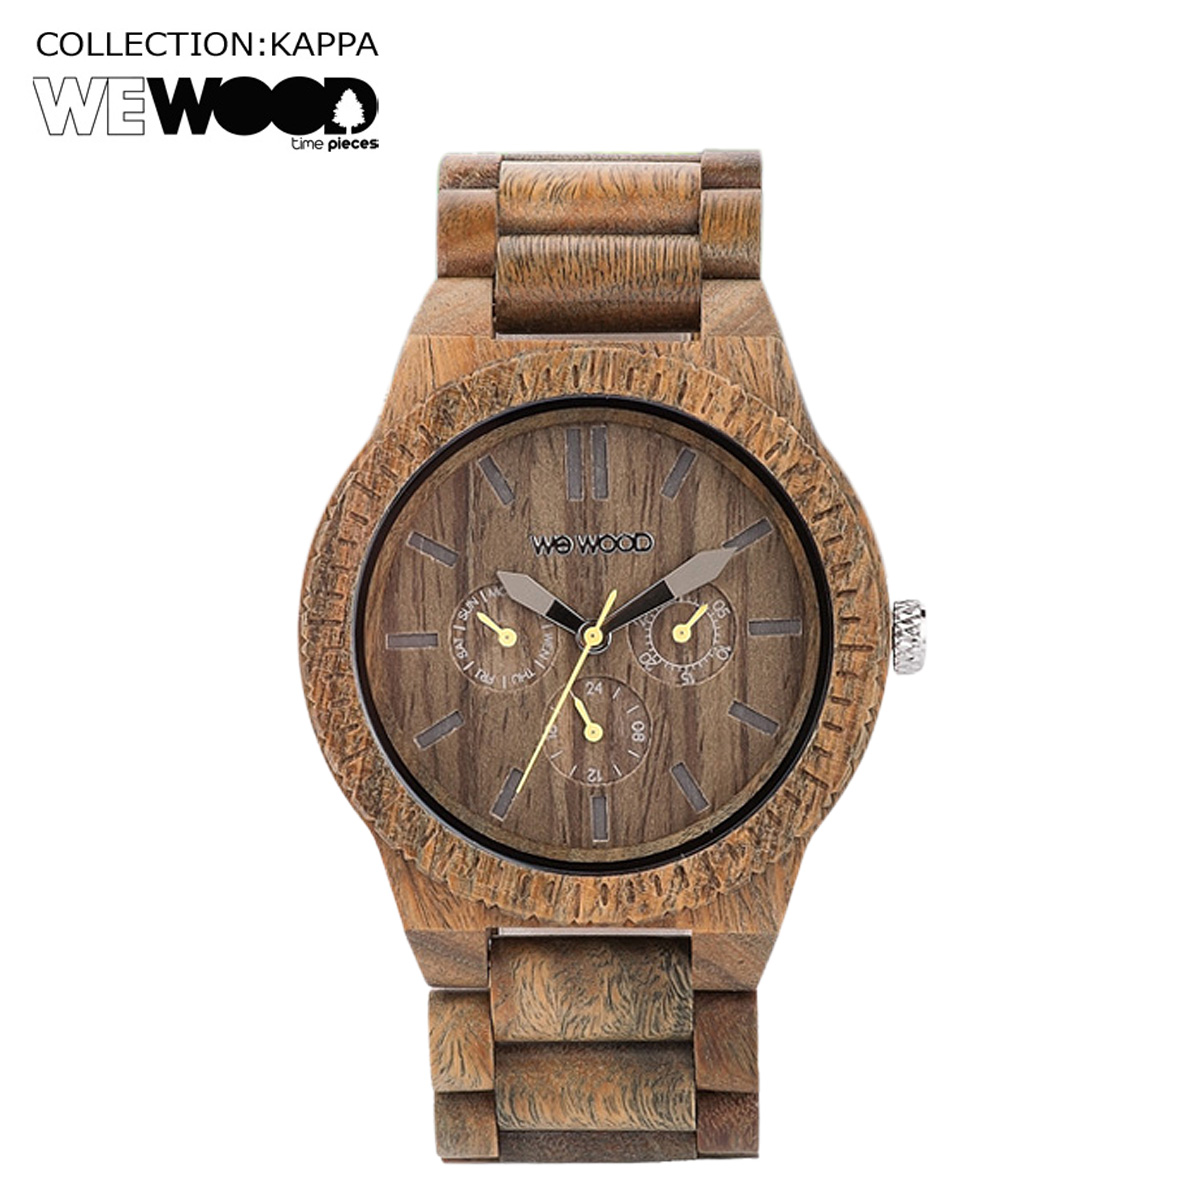 WEWOOD 腕時計 レディース ウィーウッド KAPPA アーミー ARMY NATURAL WOOD メンズ